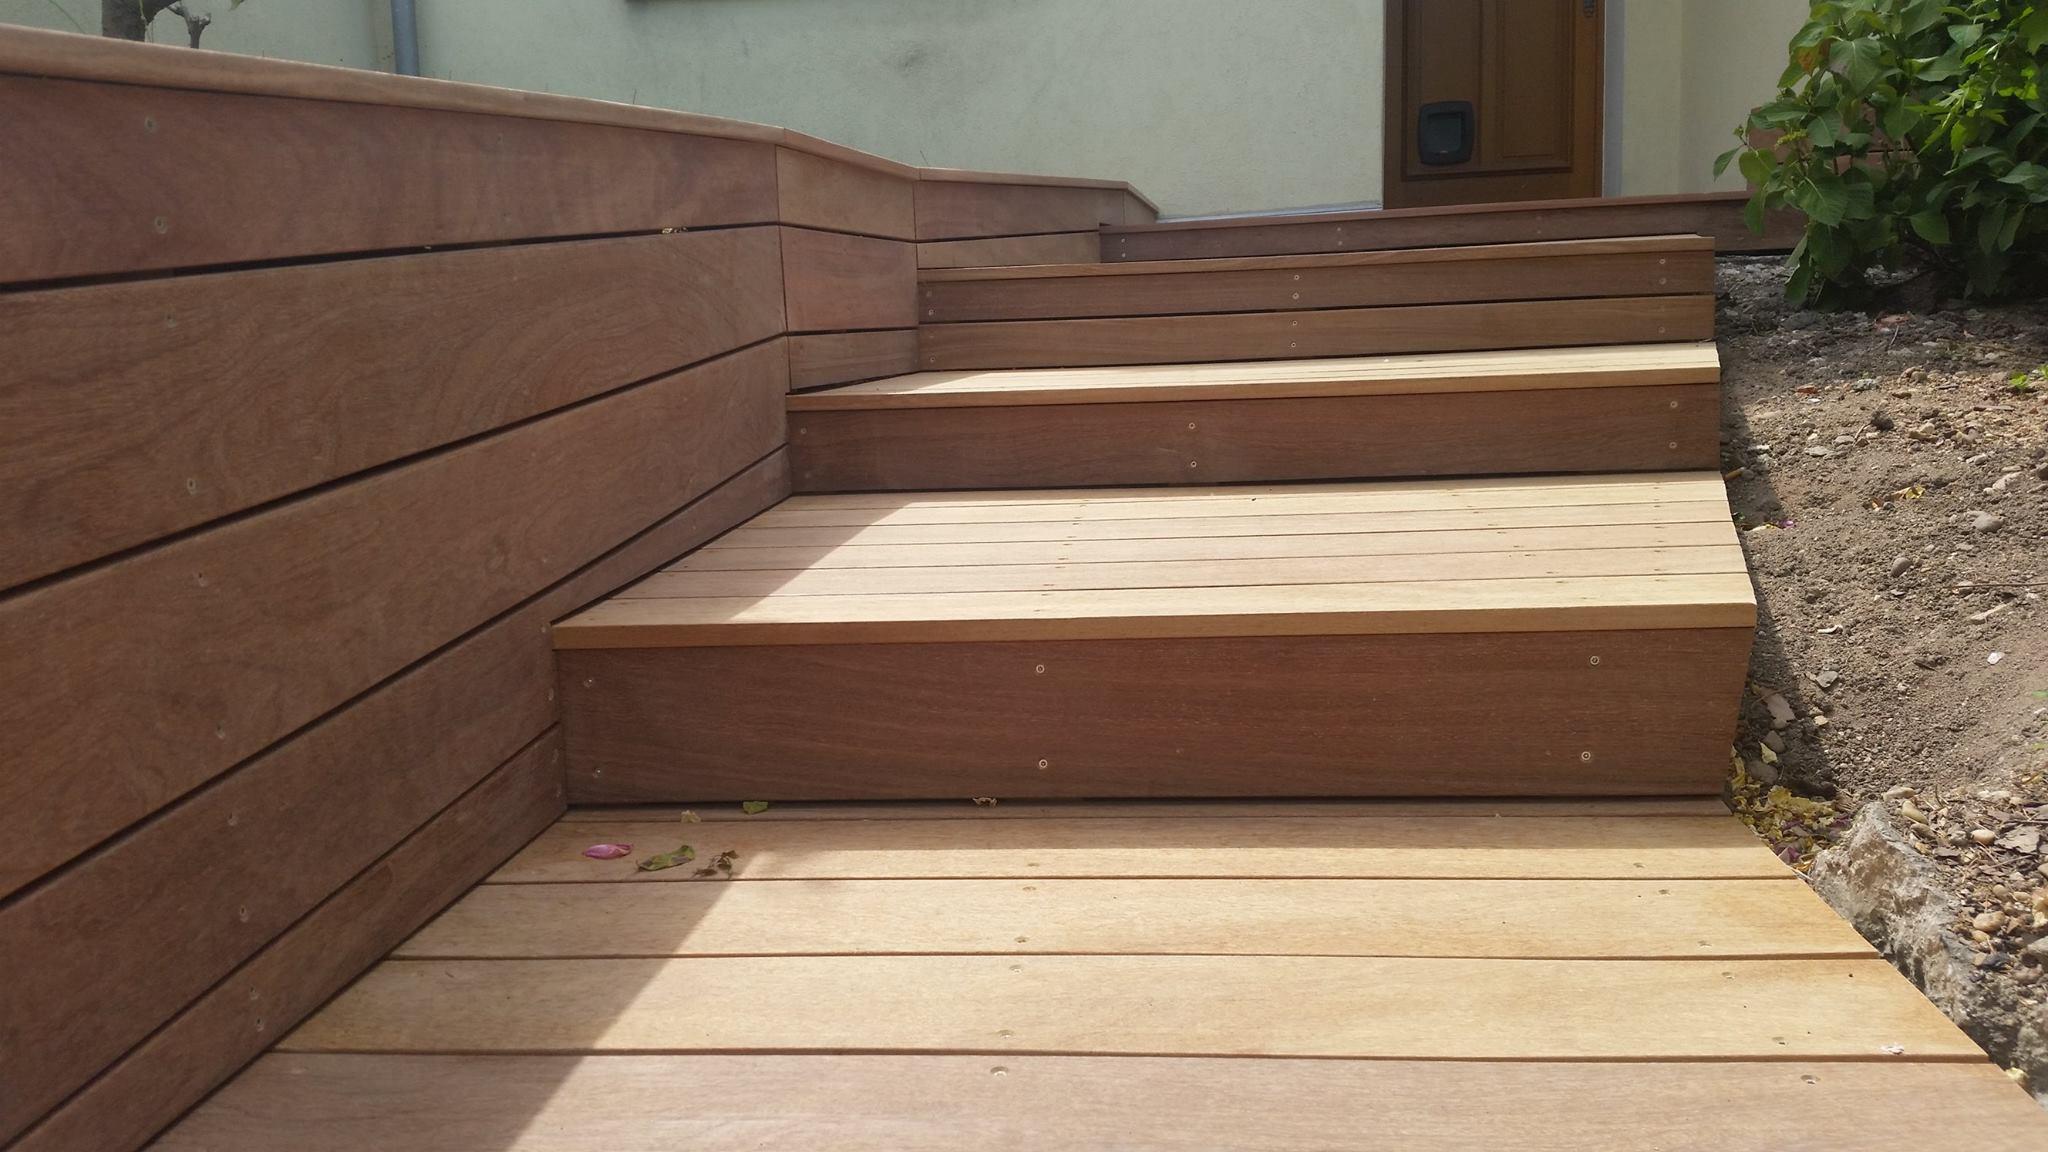 Percarbonate De Sodium Pour Terrasse Bois terrasse bois javel